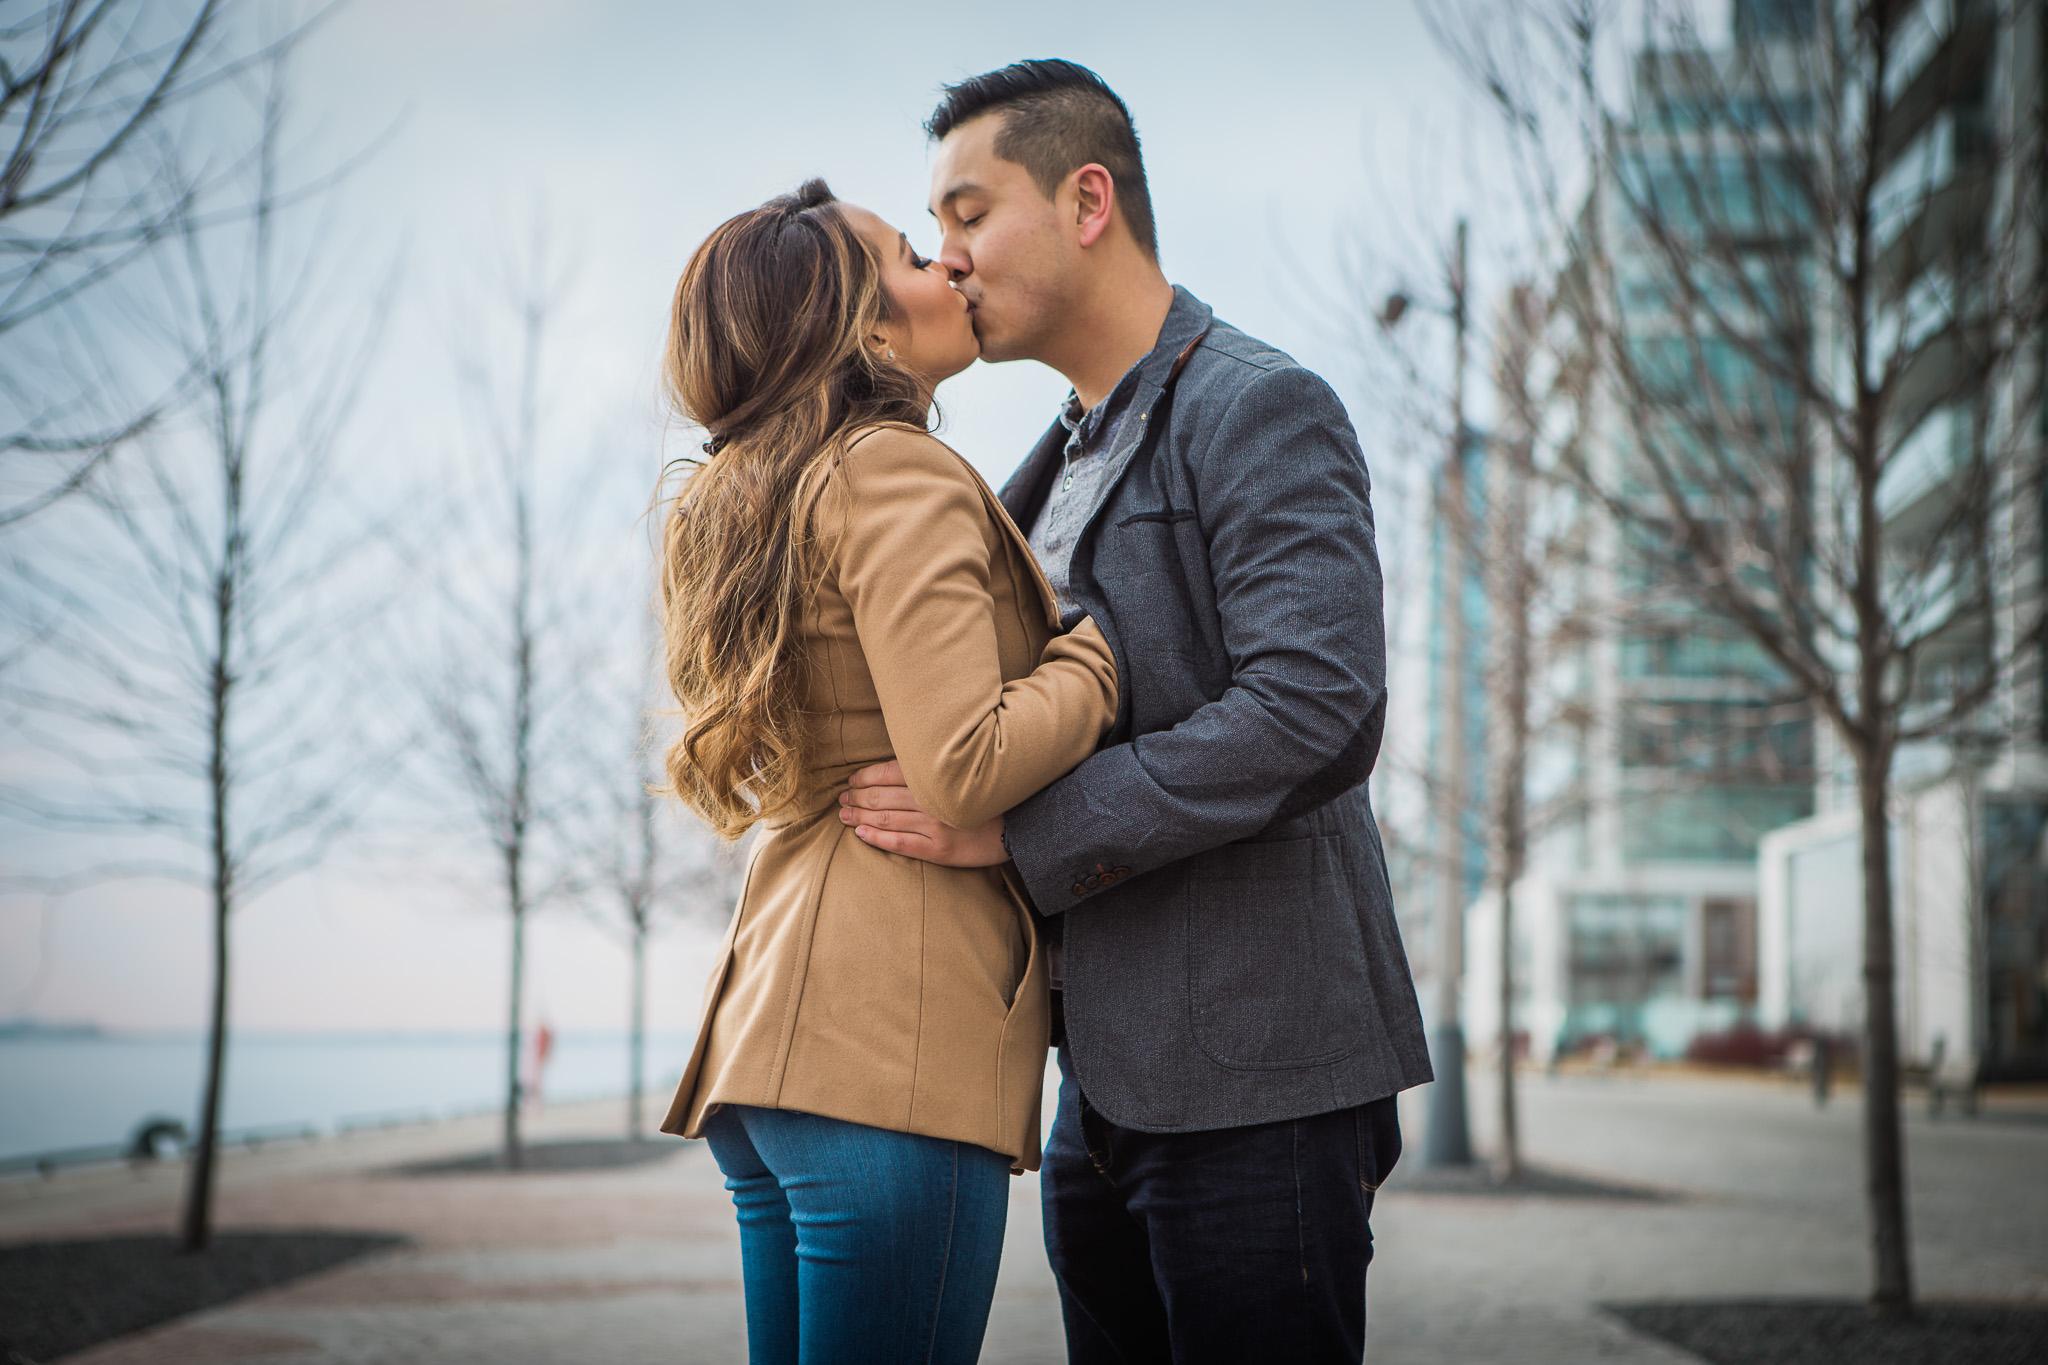 Torontoweddingphotographer-26.jpg